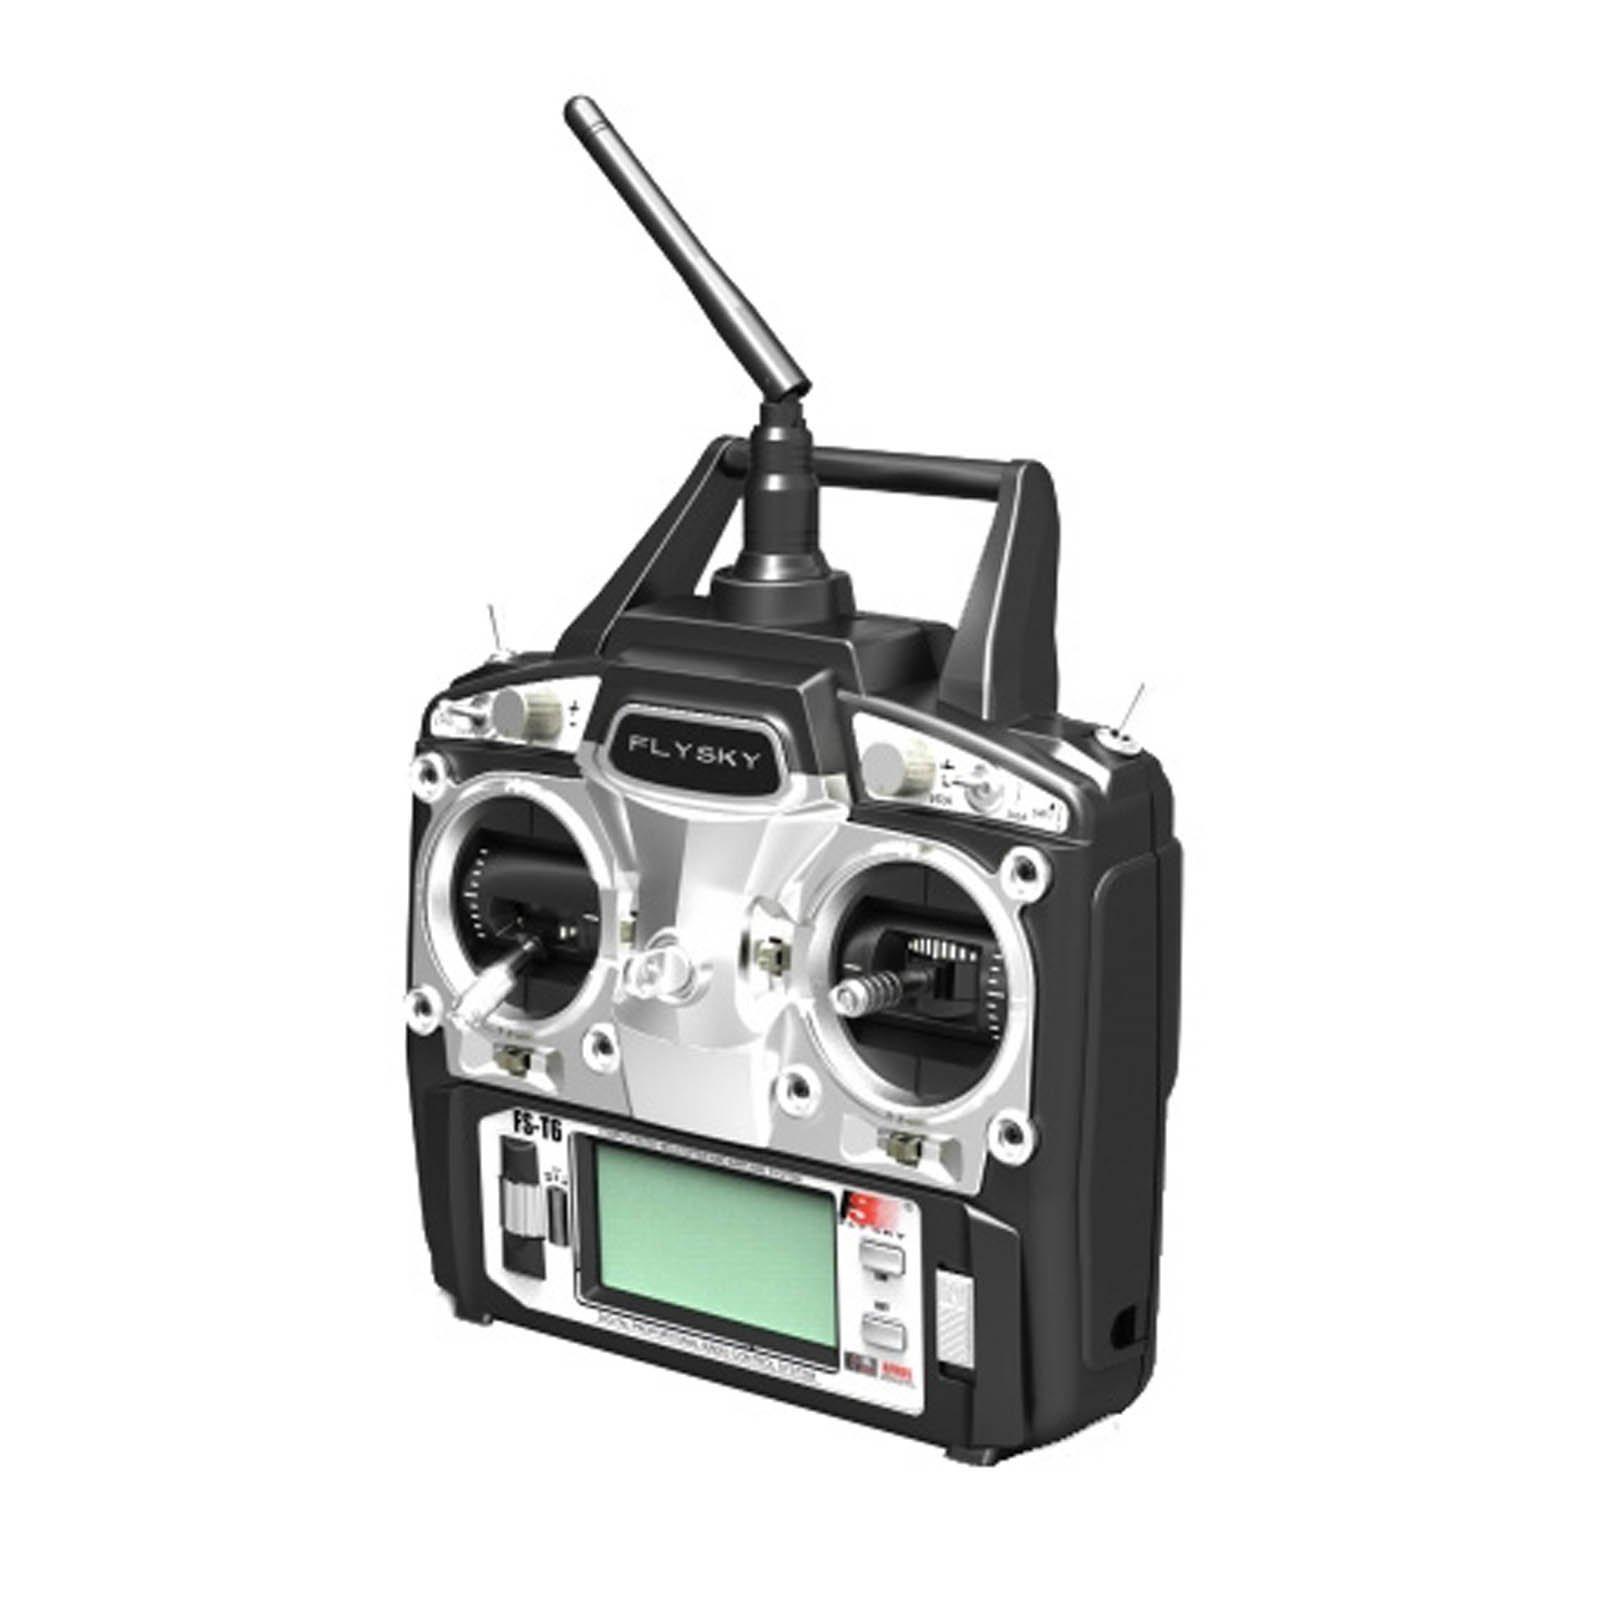 FlySky 2.4GHz 6 Channel Digital Transmitter and Receiver ...  FlySky 2.4GHz 6...